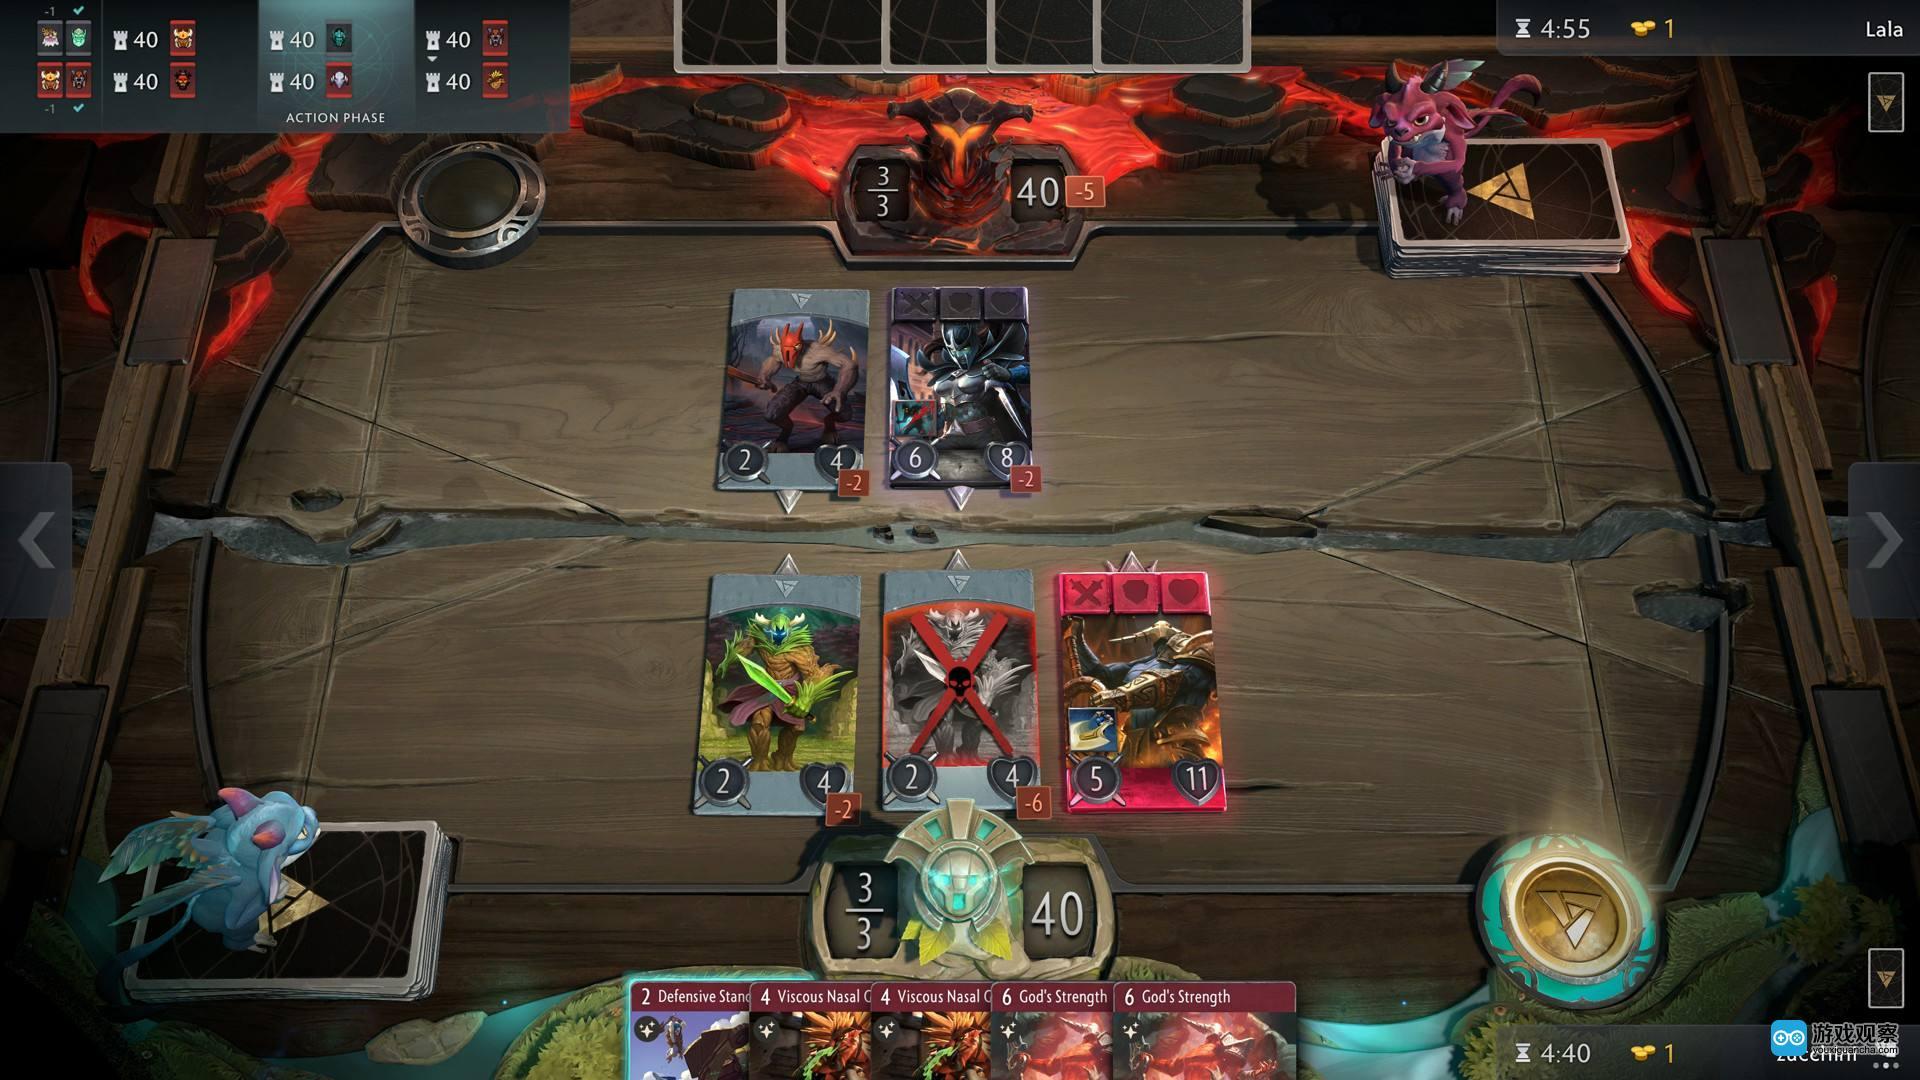 Valve 开发发行的卡牌游戏 Artifact